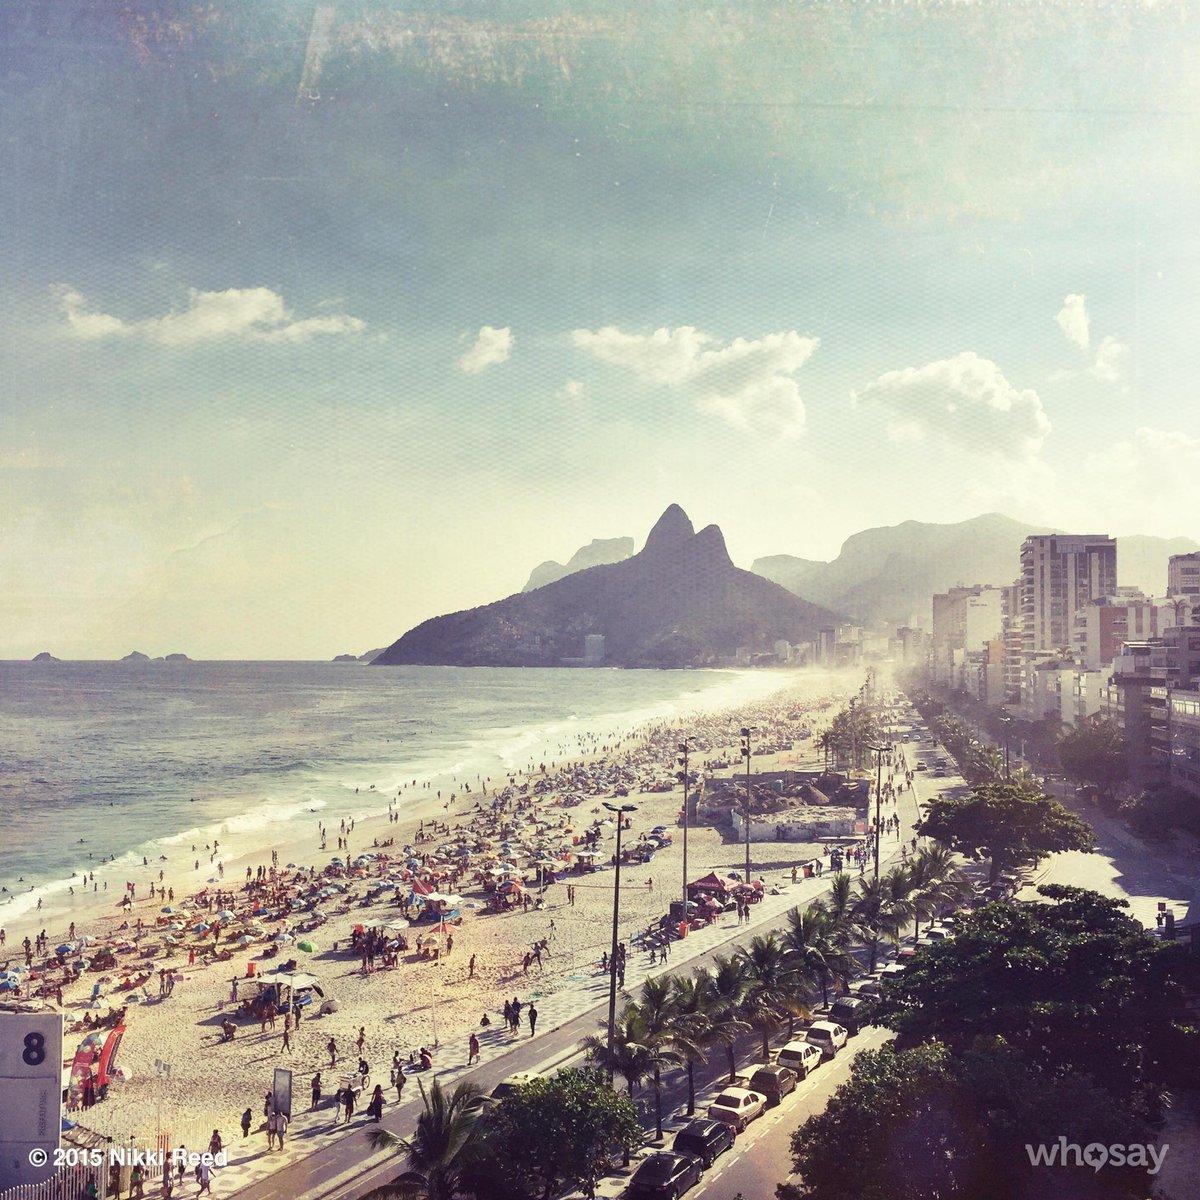 bom dia Brasil...eu te amo http://t.co/ytMzrRPTlz